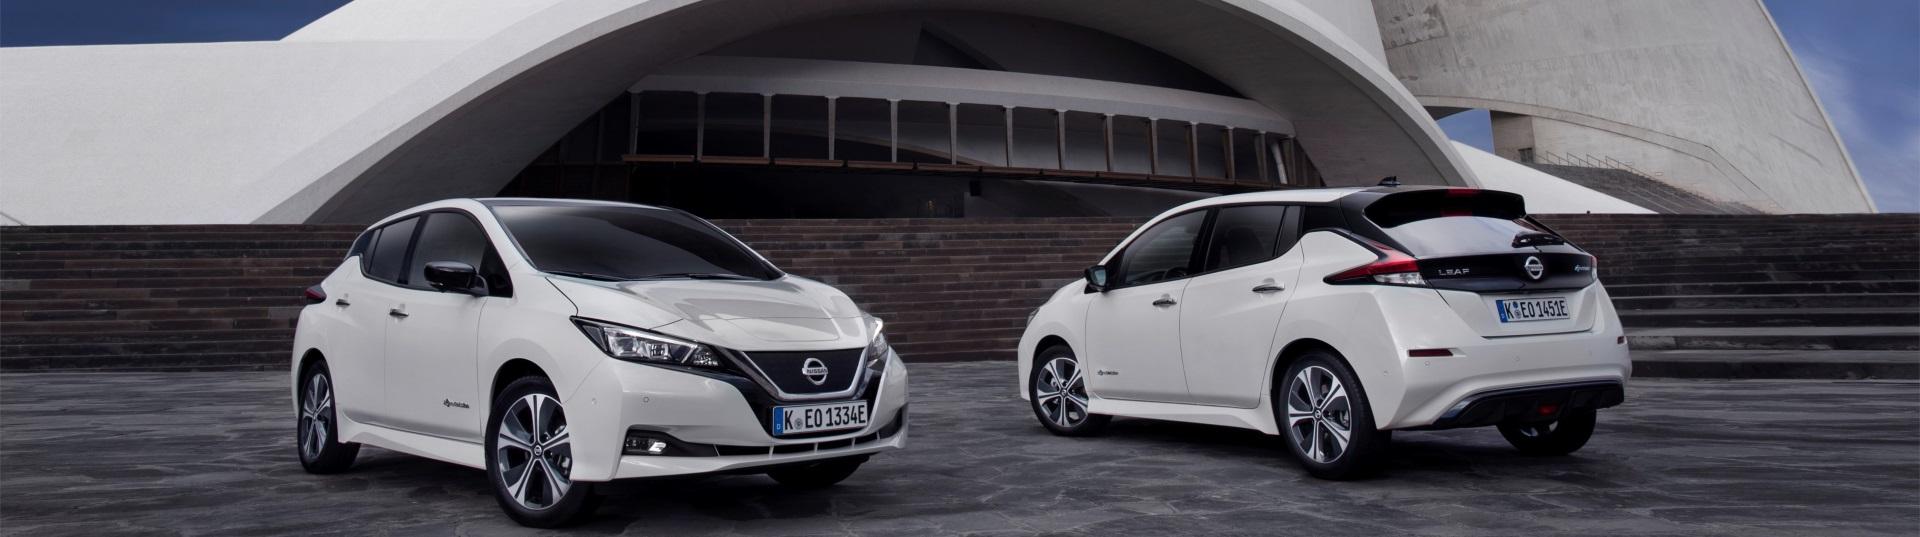 Nissan Leaf_2018_1920